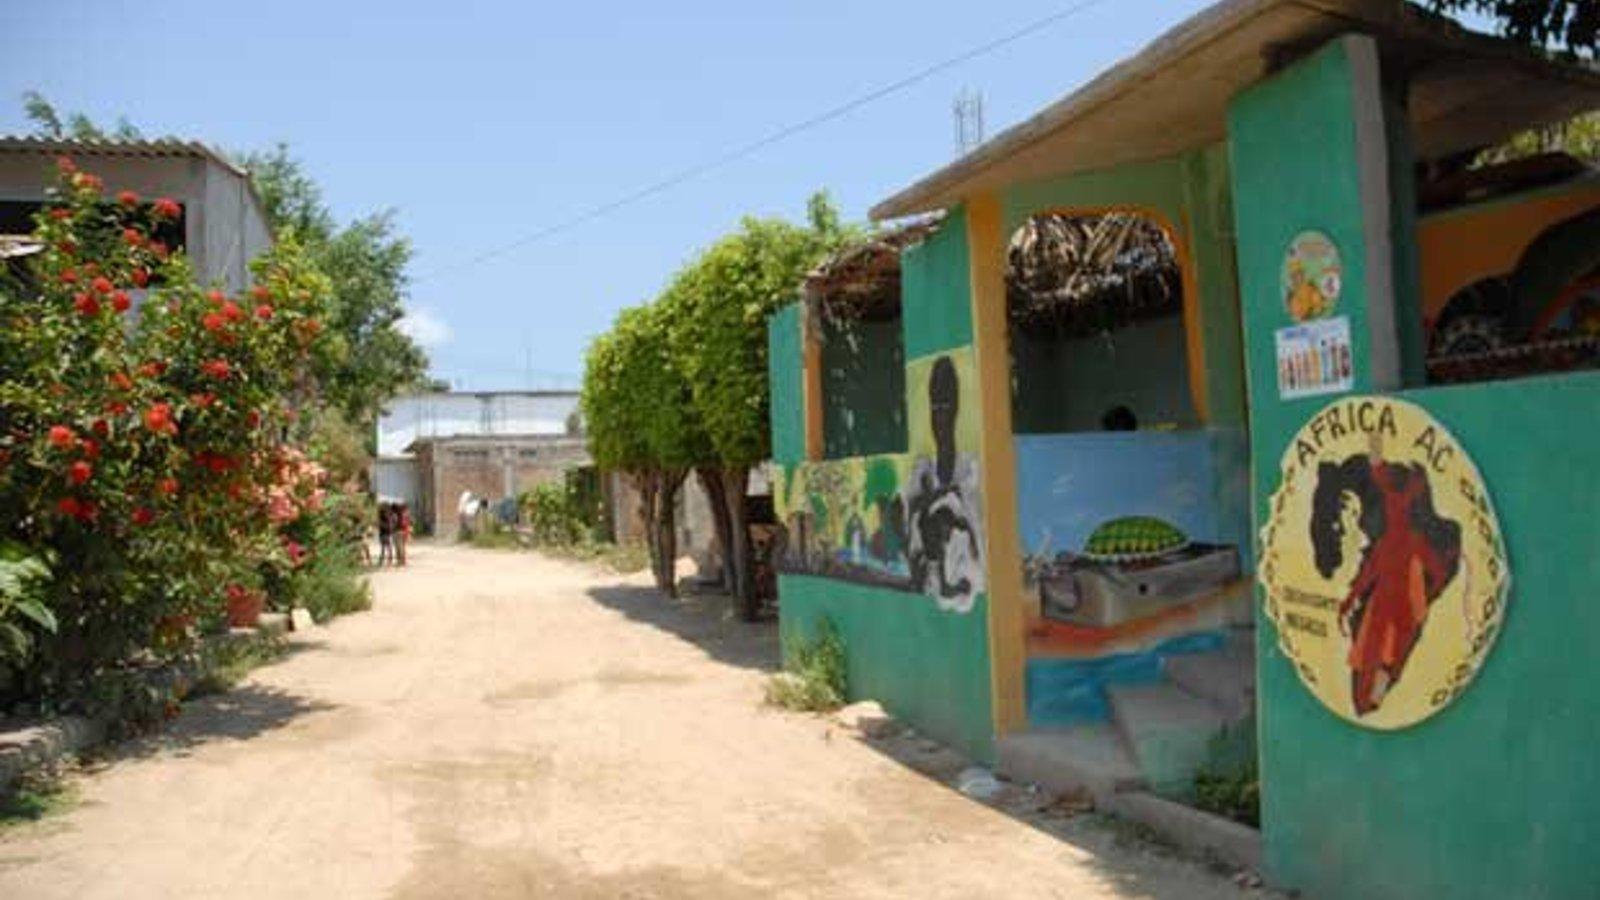 Mexico & Peru - The Black Grandma in the Closet